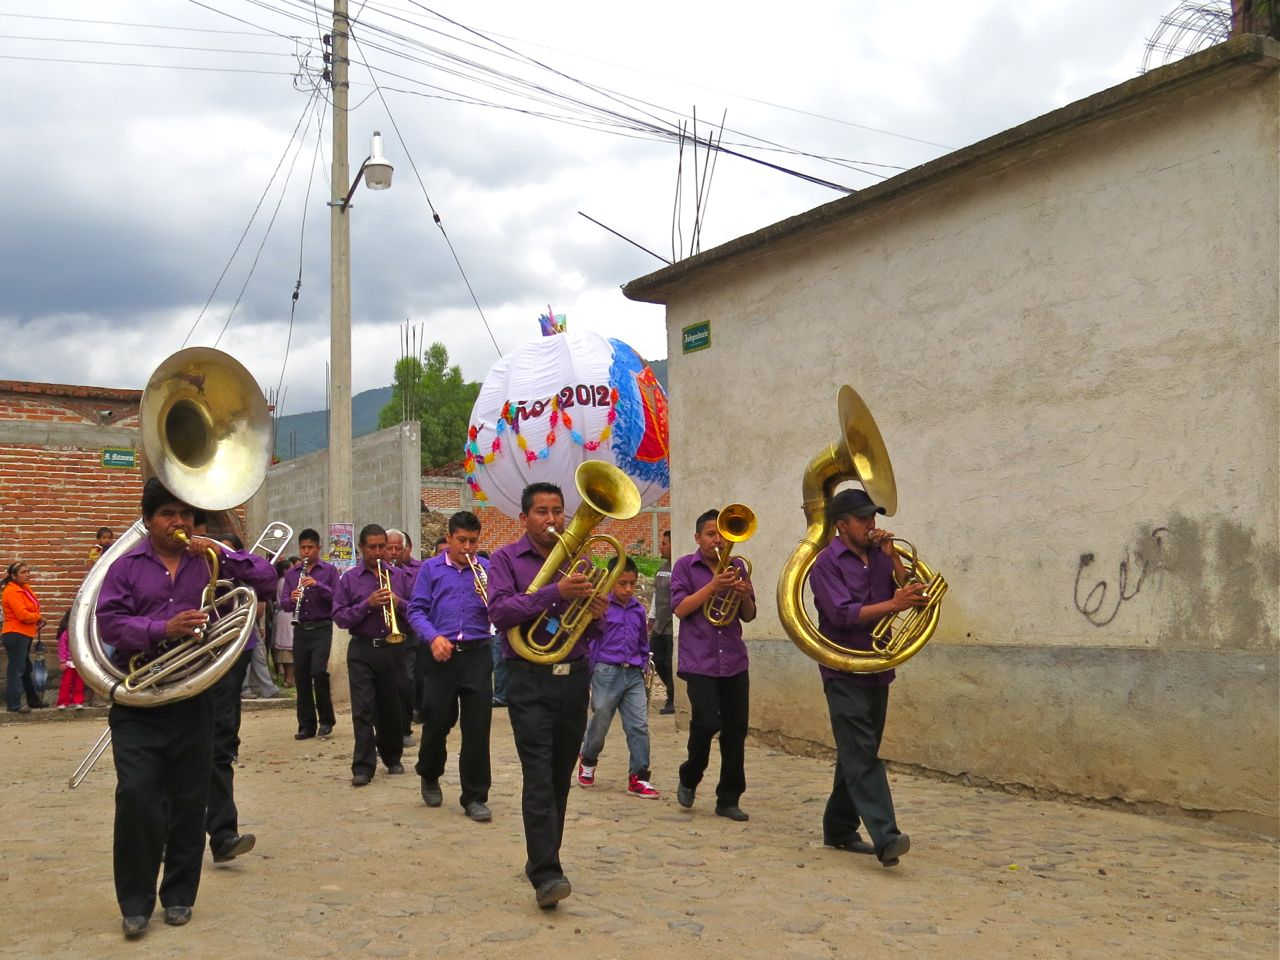 Banda marching down street